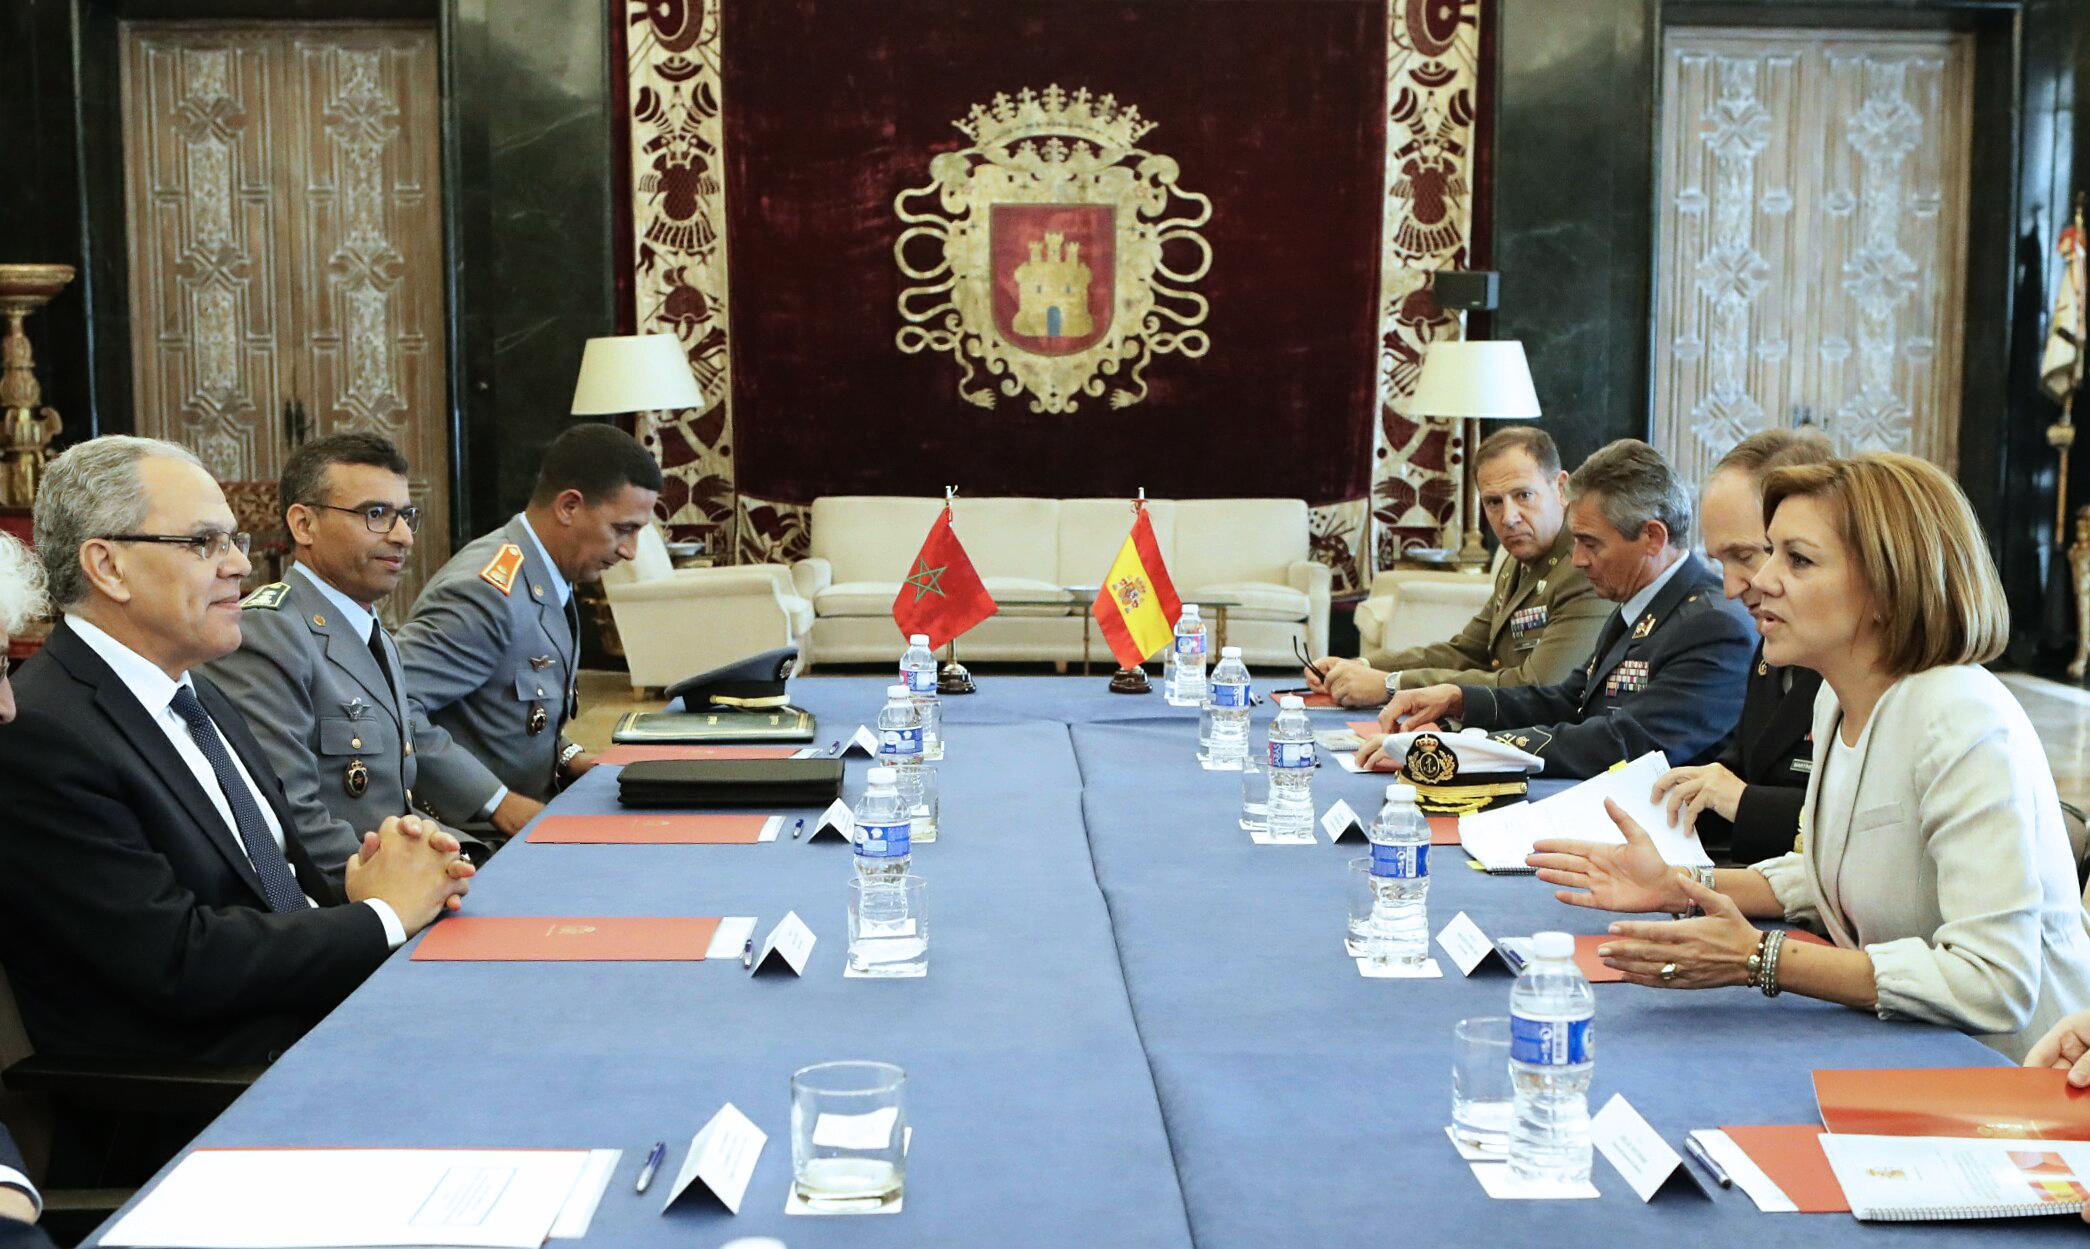 Coopération militaire maroco-espagnole - Page 5 33400231044_9ab6659f23_o